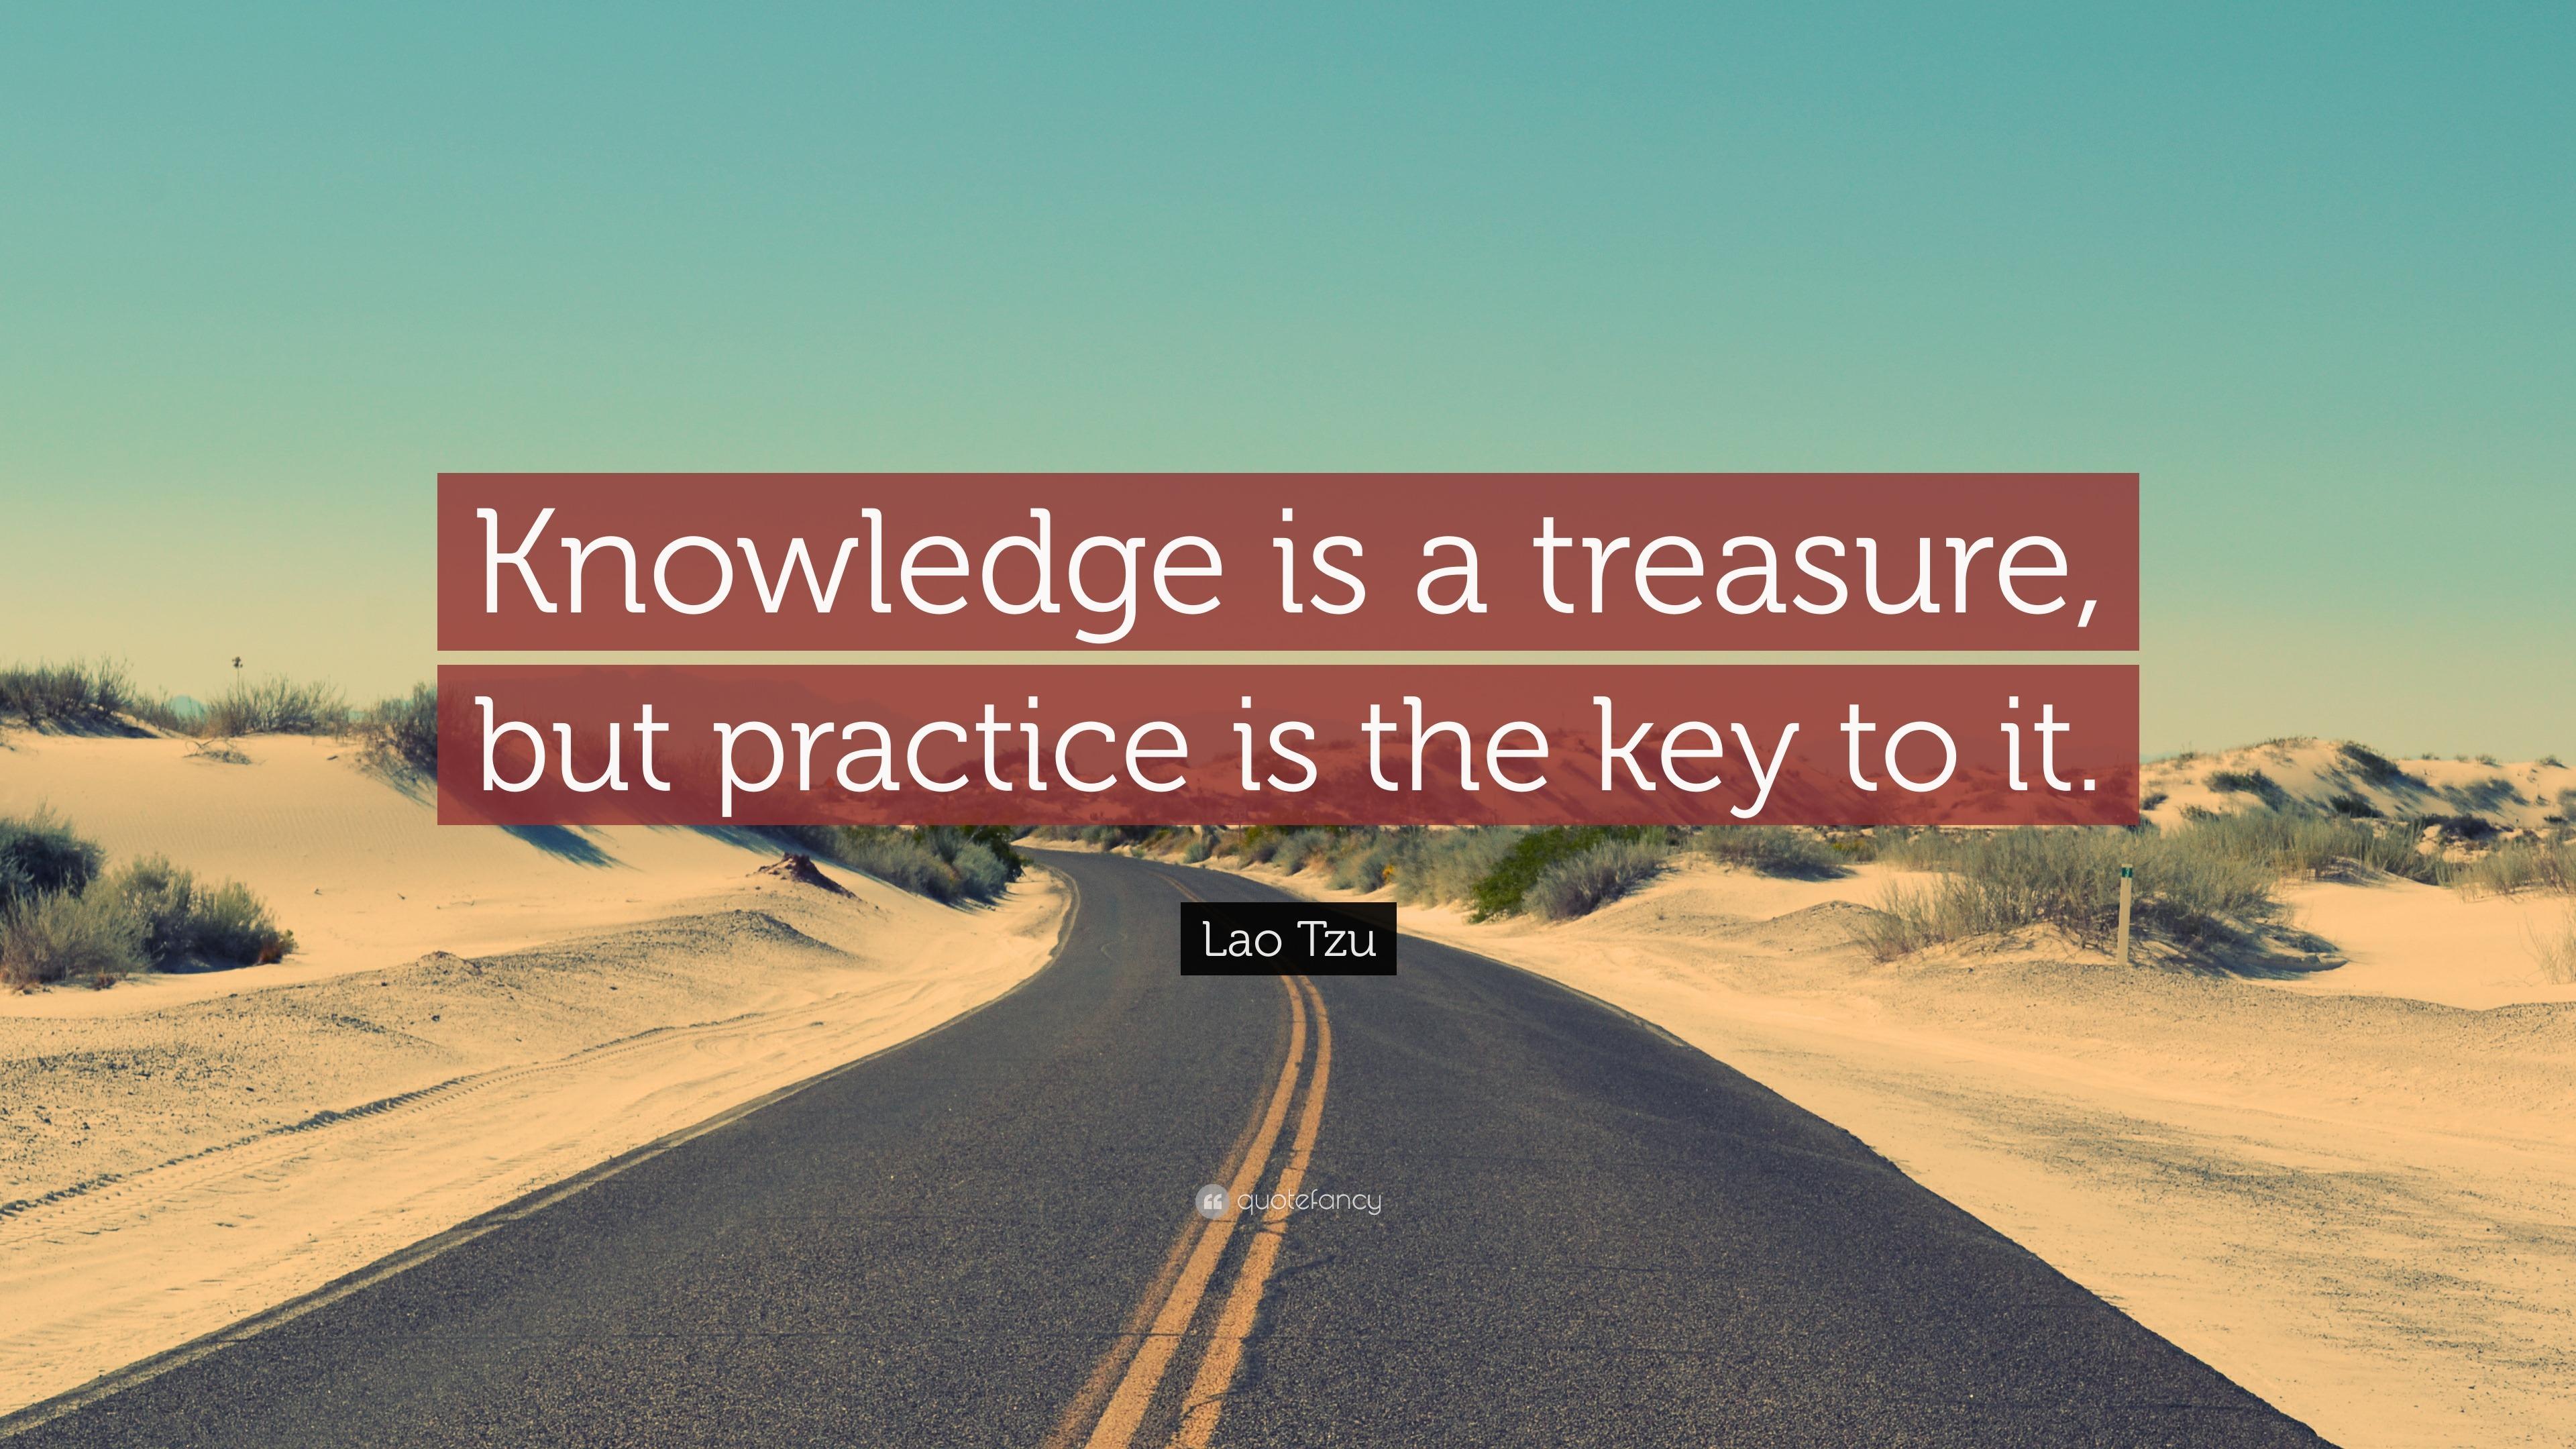 lao tzu quote knowledge is a treasure but practice is the key lao tzu quote knowledge is a treasure but practice is the key to